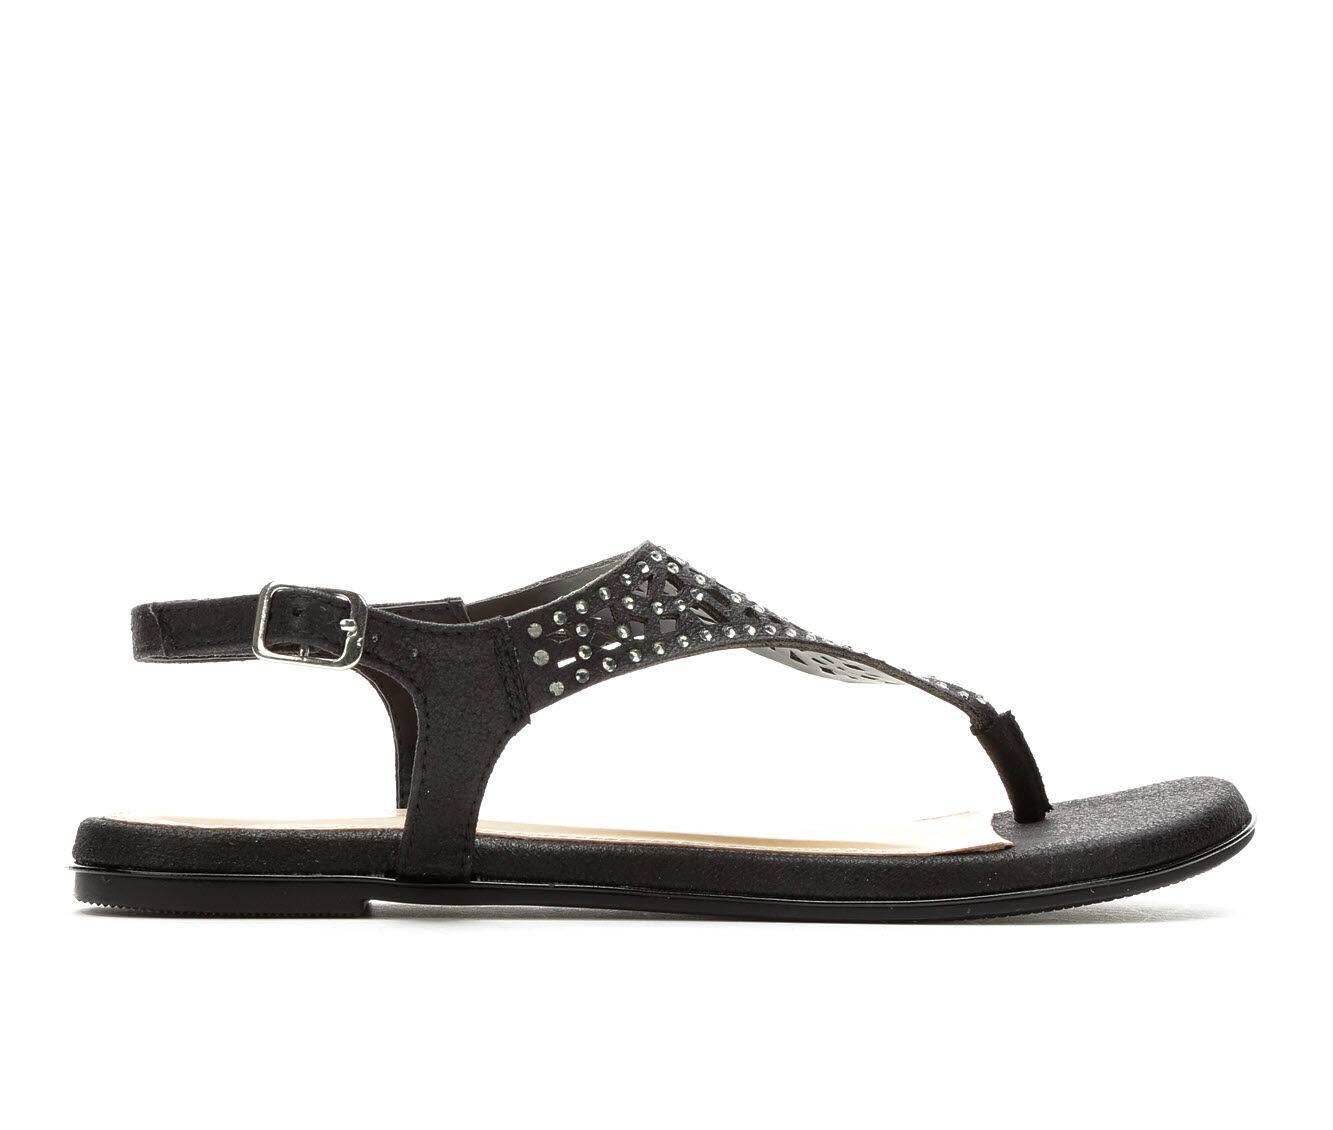 uk shoes_kd6623